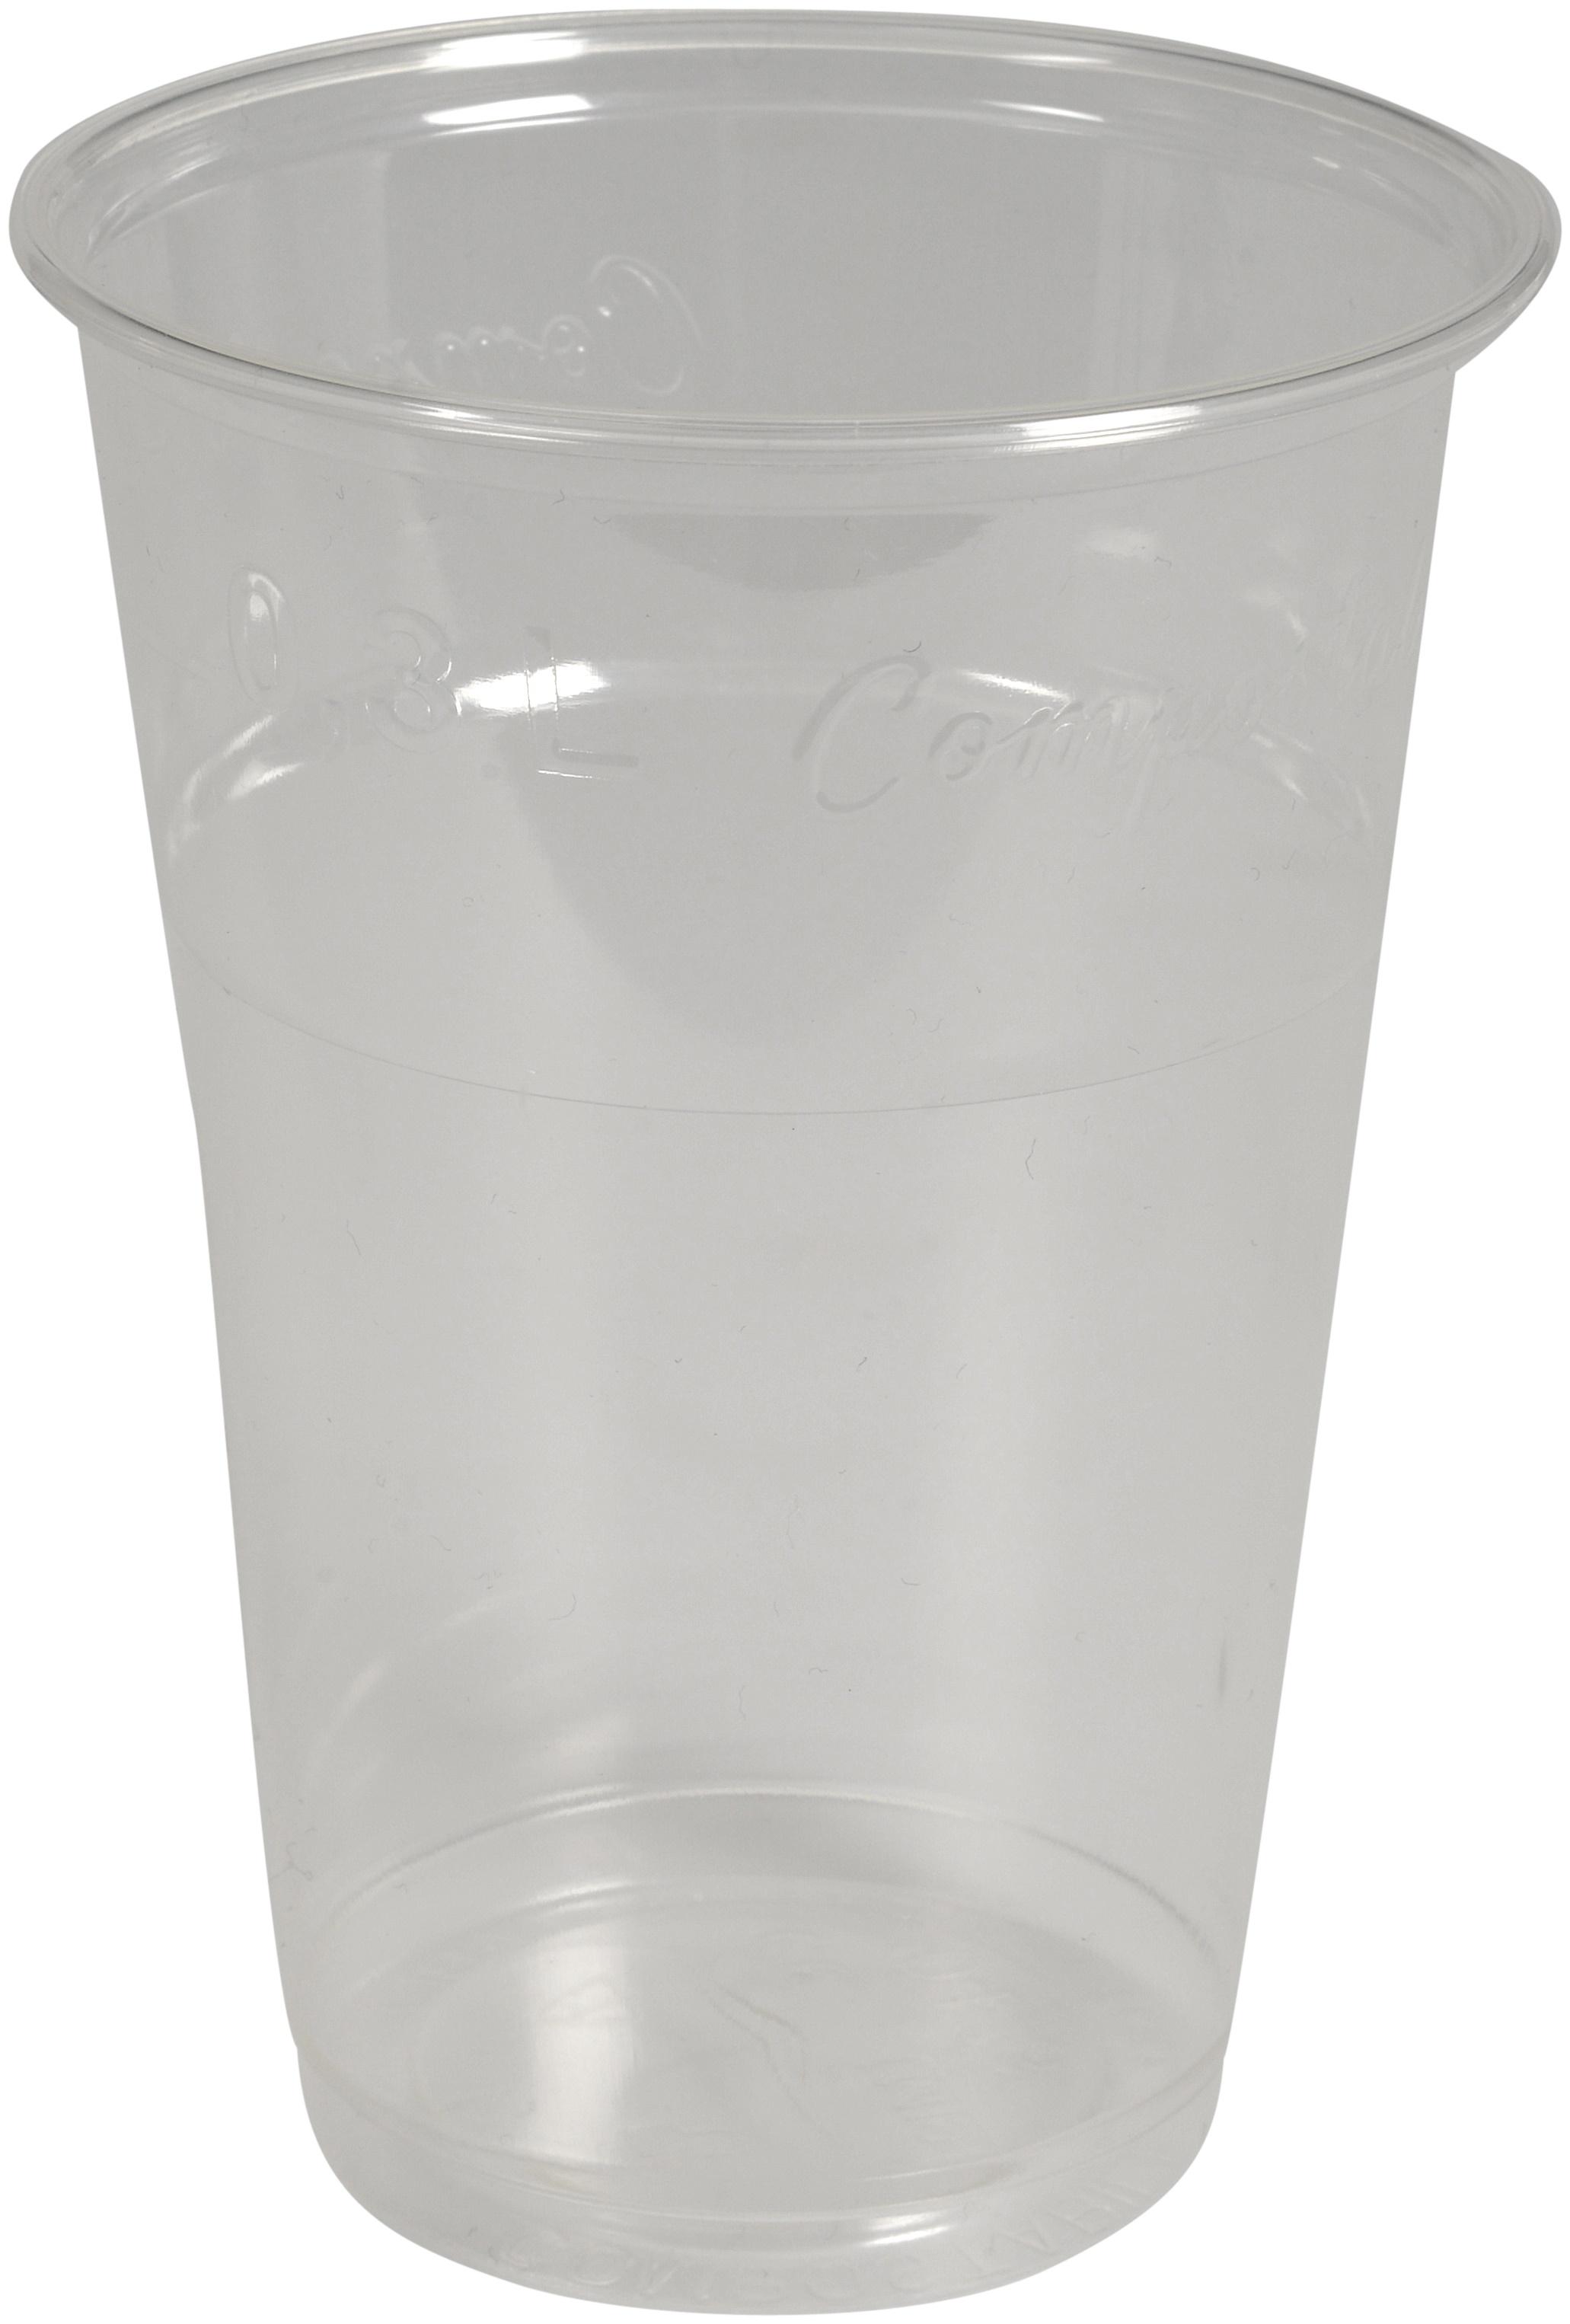 GLAS PLAST TRANSPARENT 20CL POLYPROPYLEN